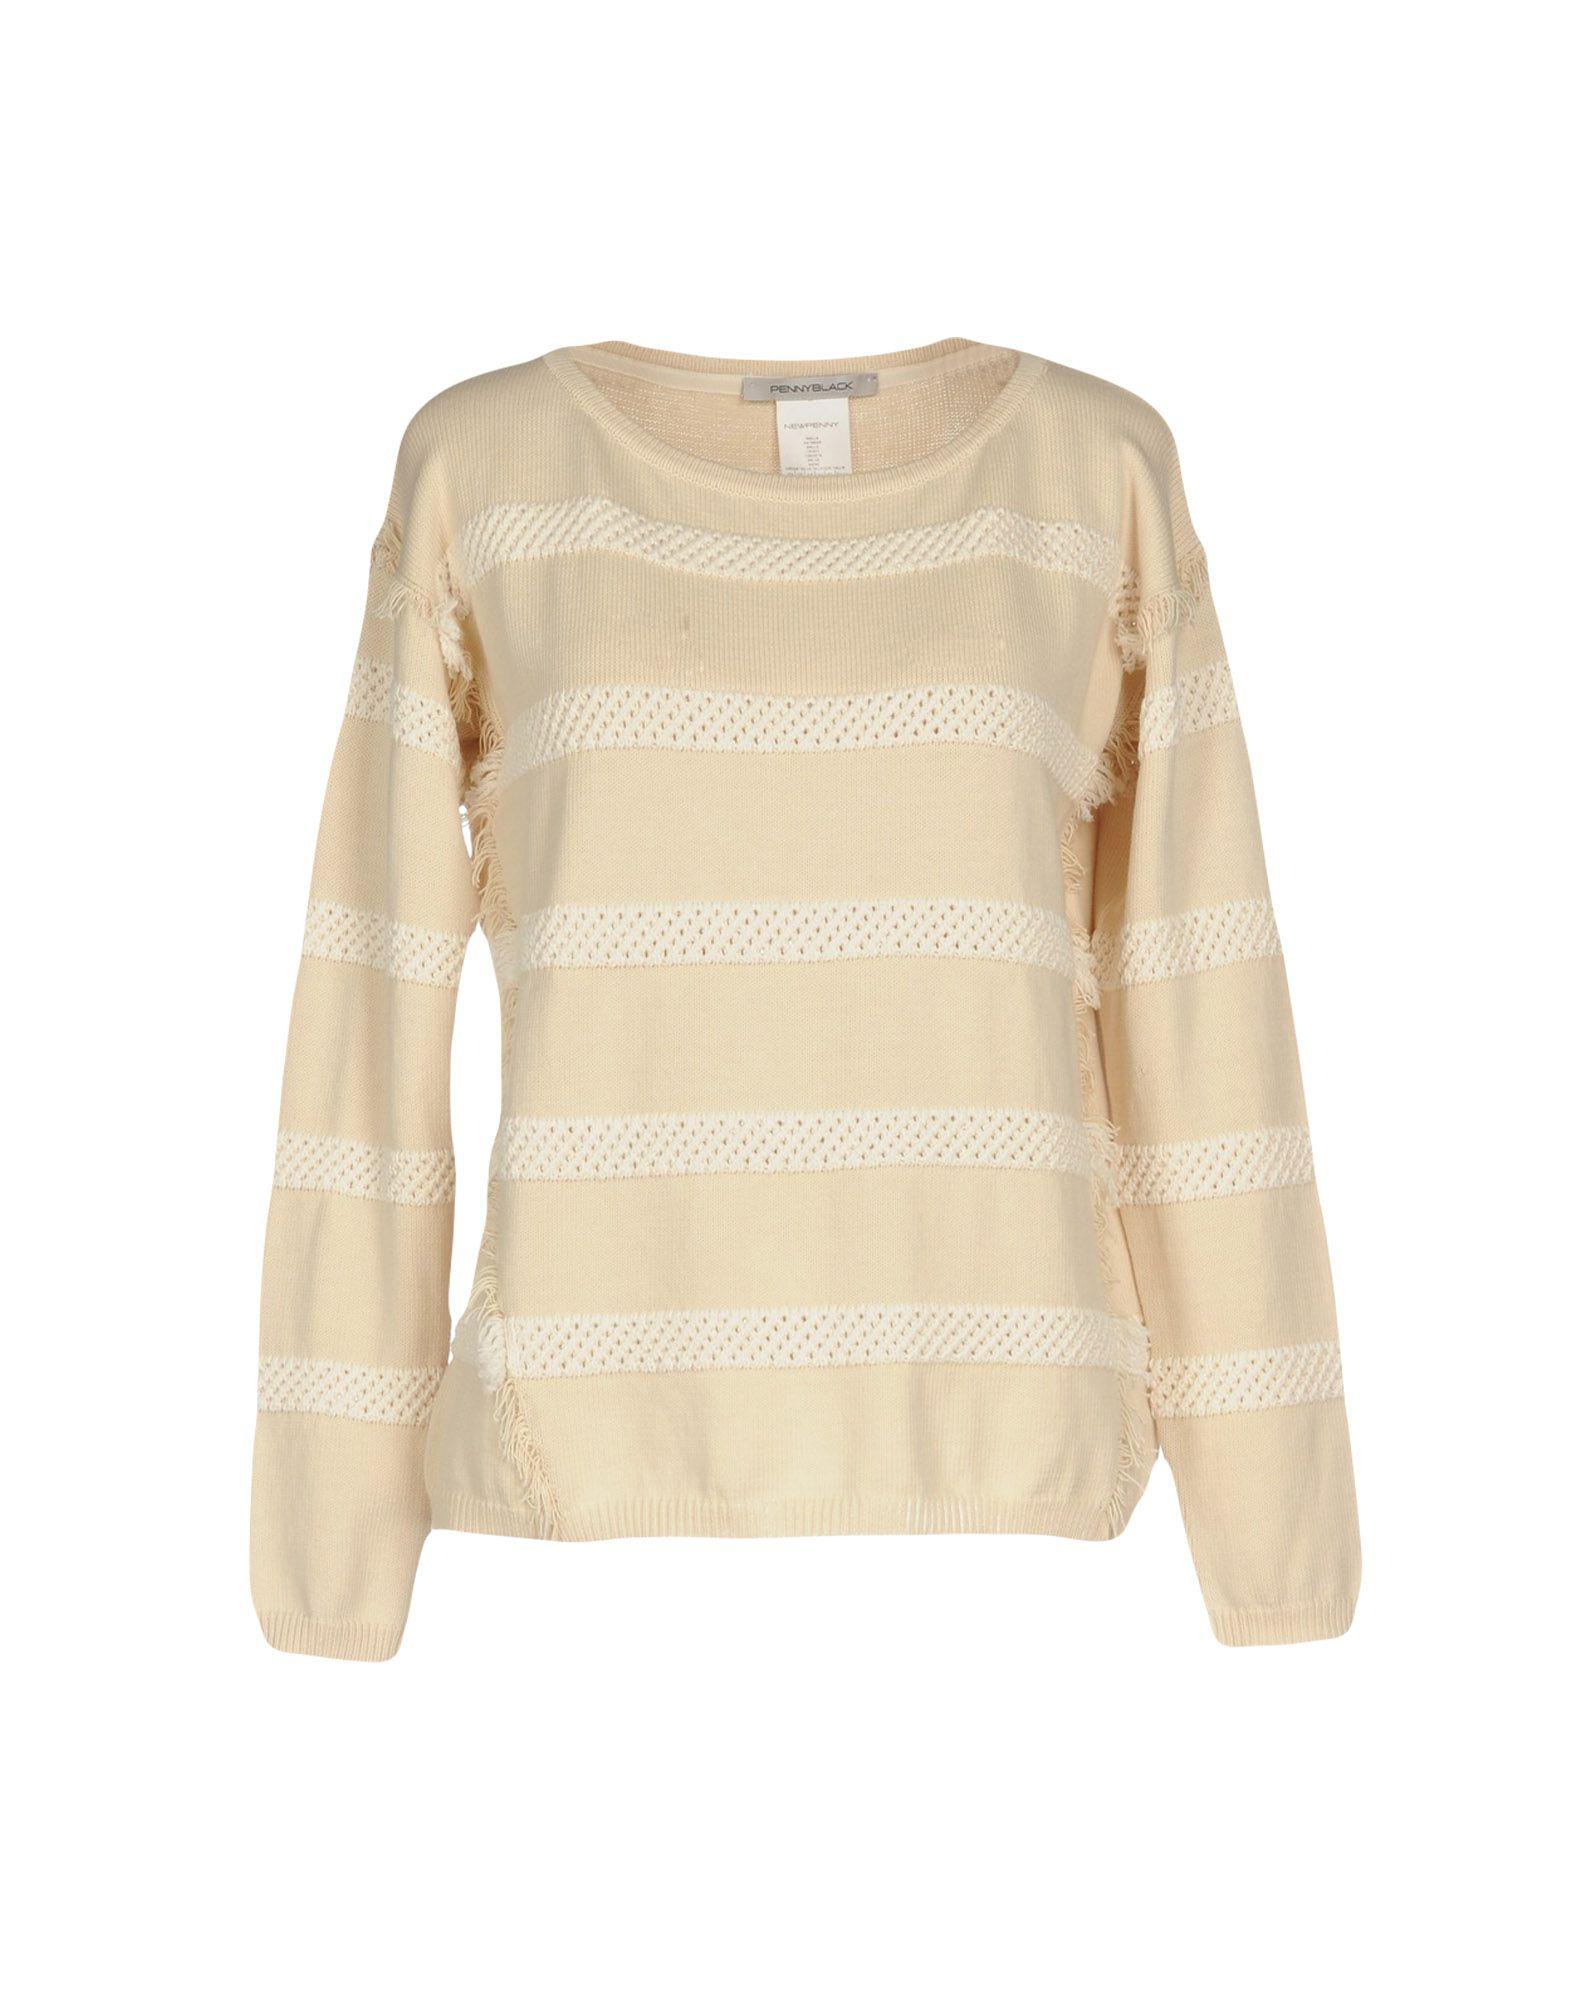 ФОТО pennyblack свитер